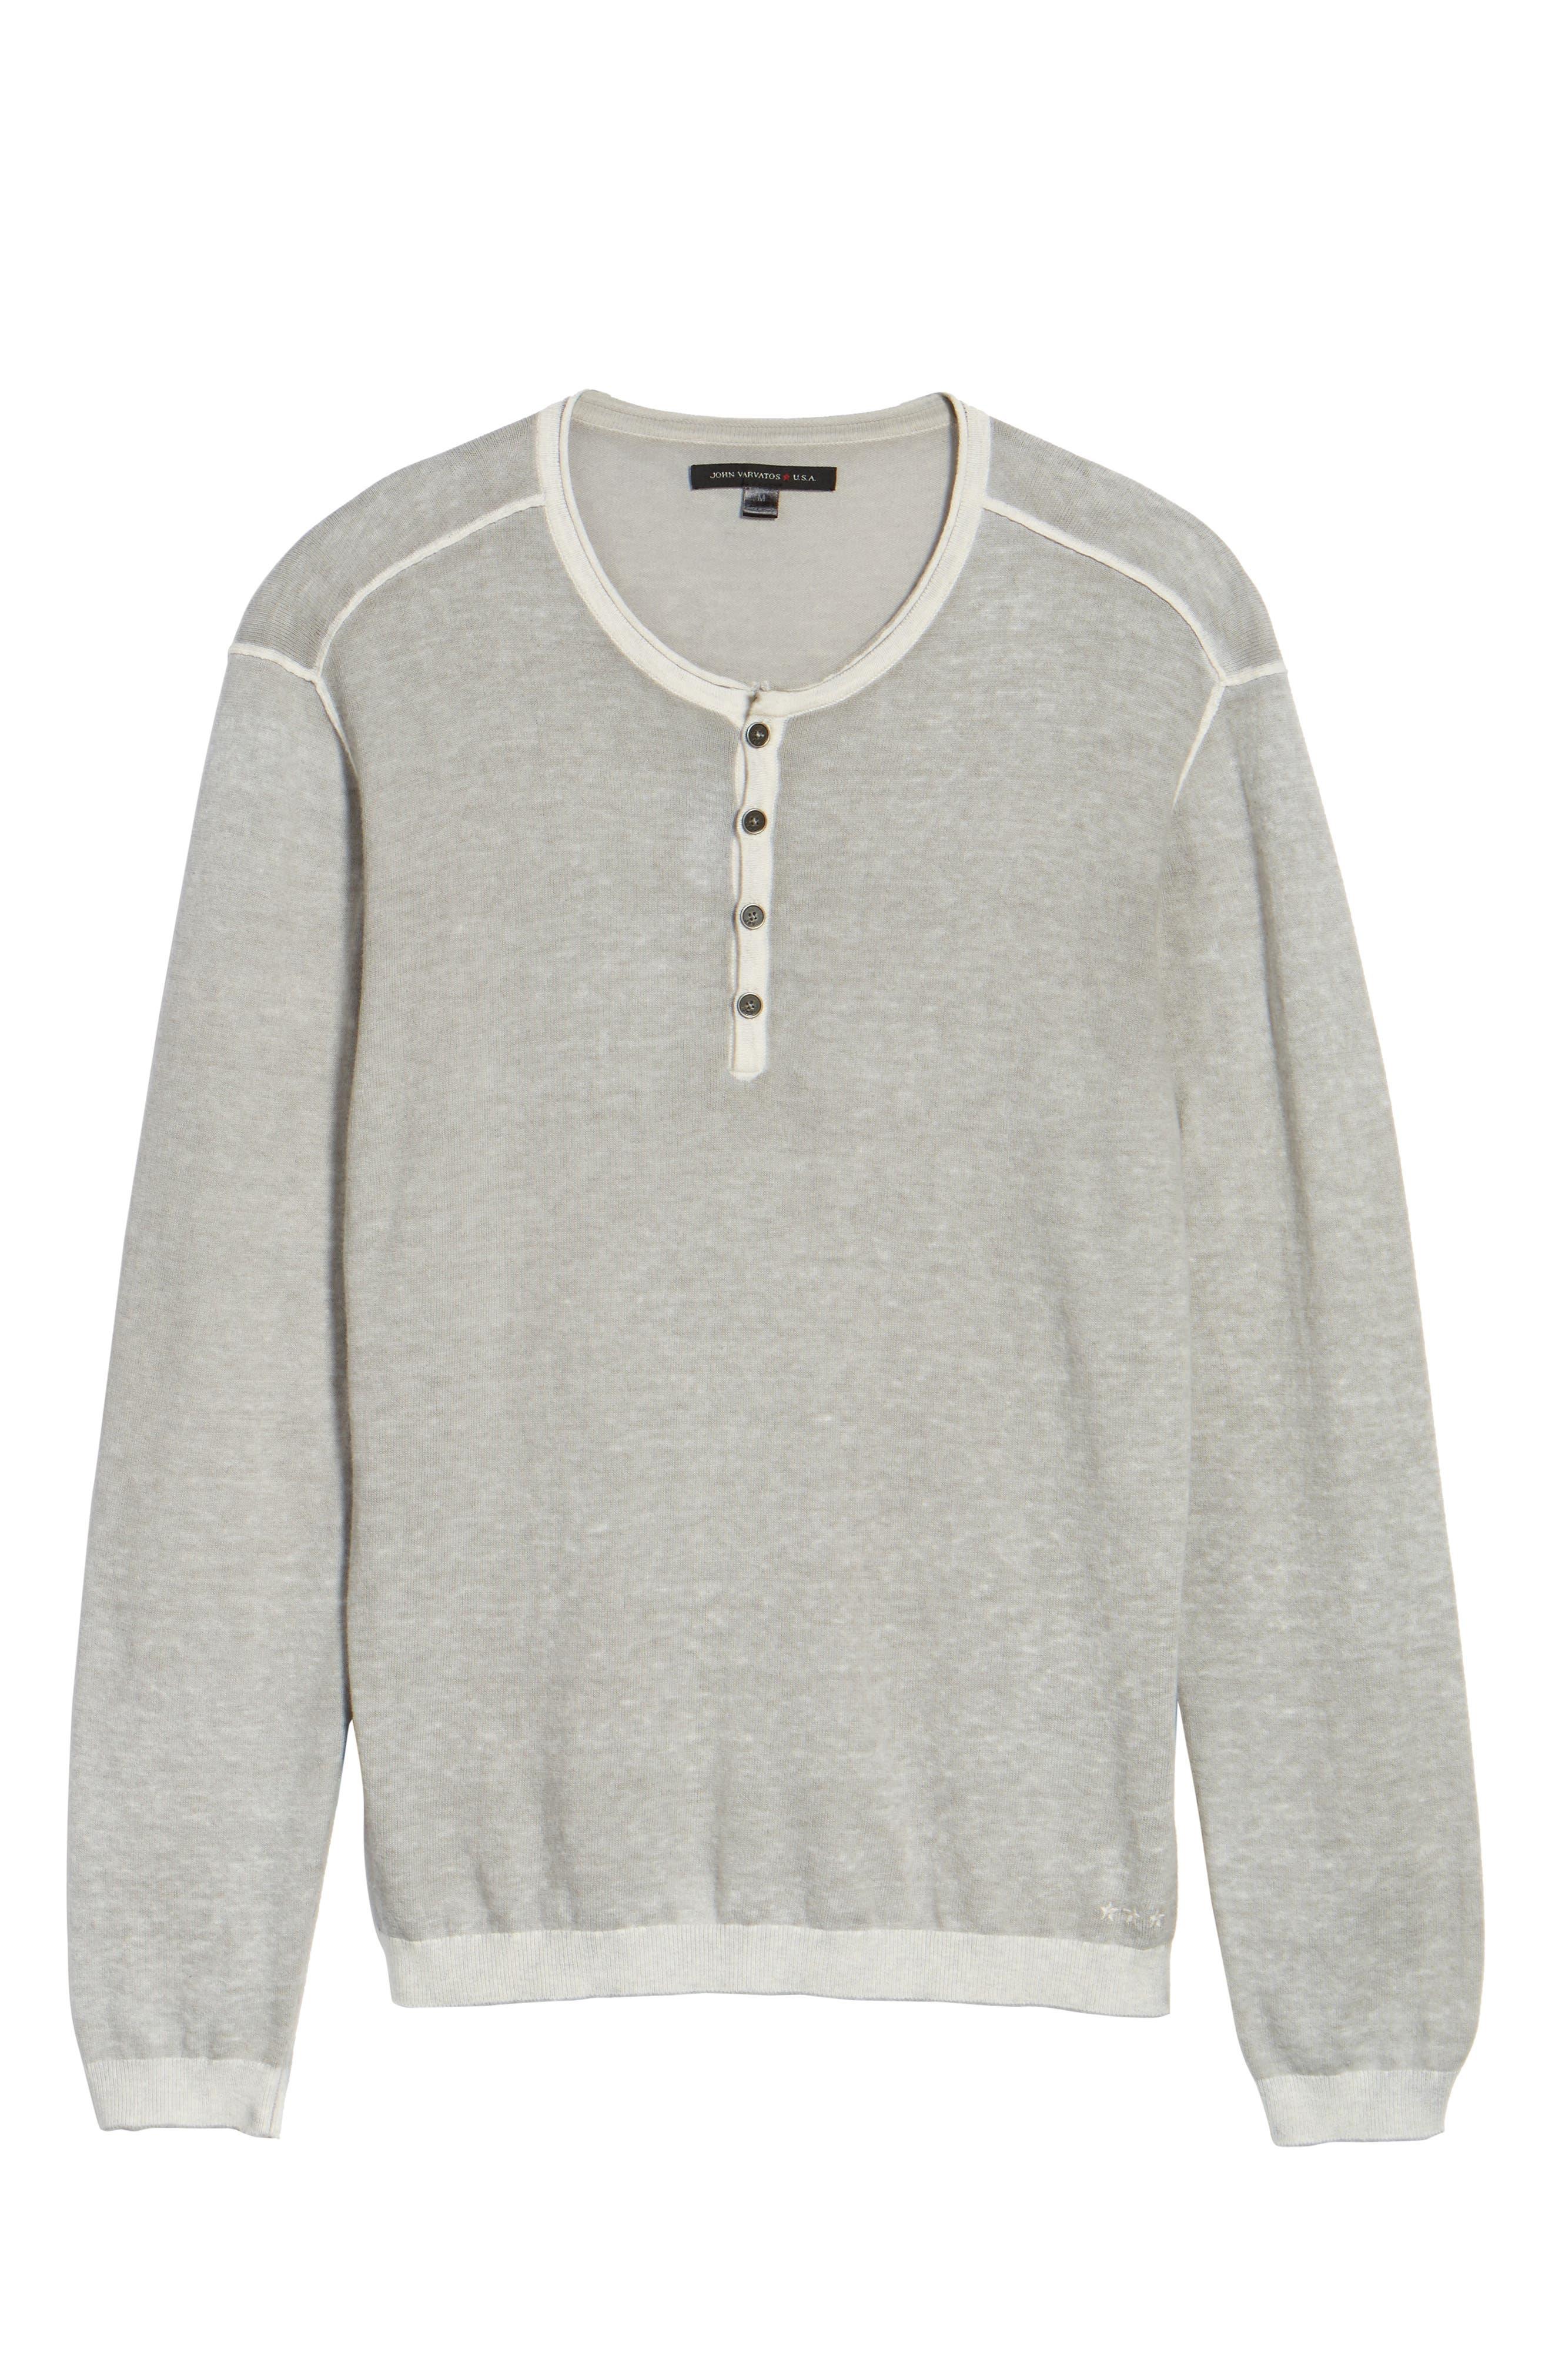 Henley Sweater,                             Alternate thumbnail 6, color,                             137